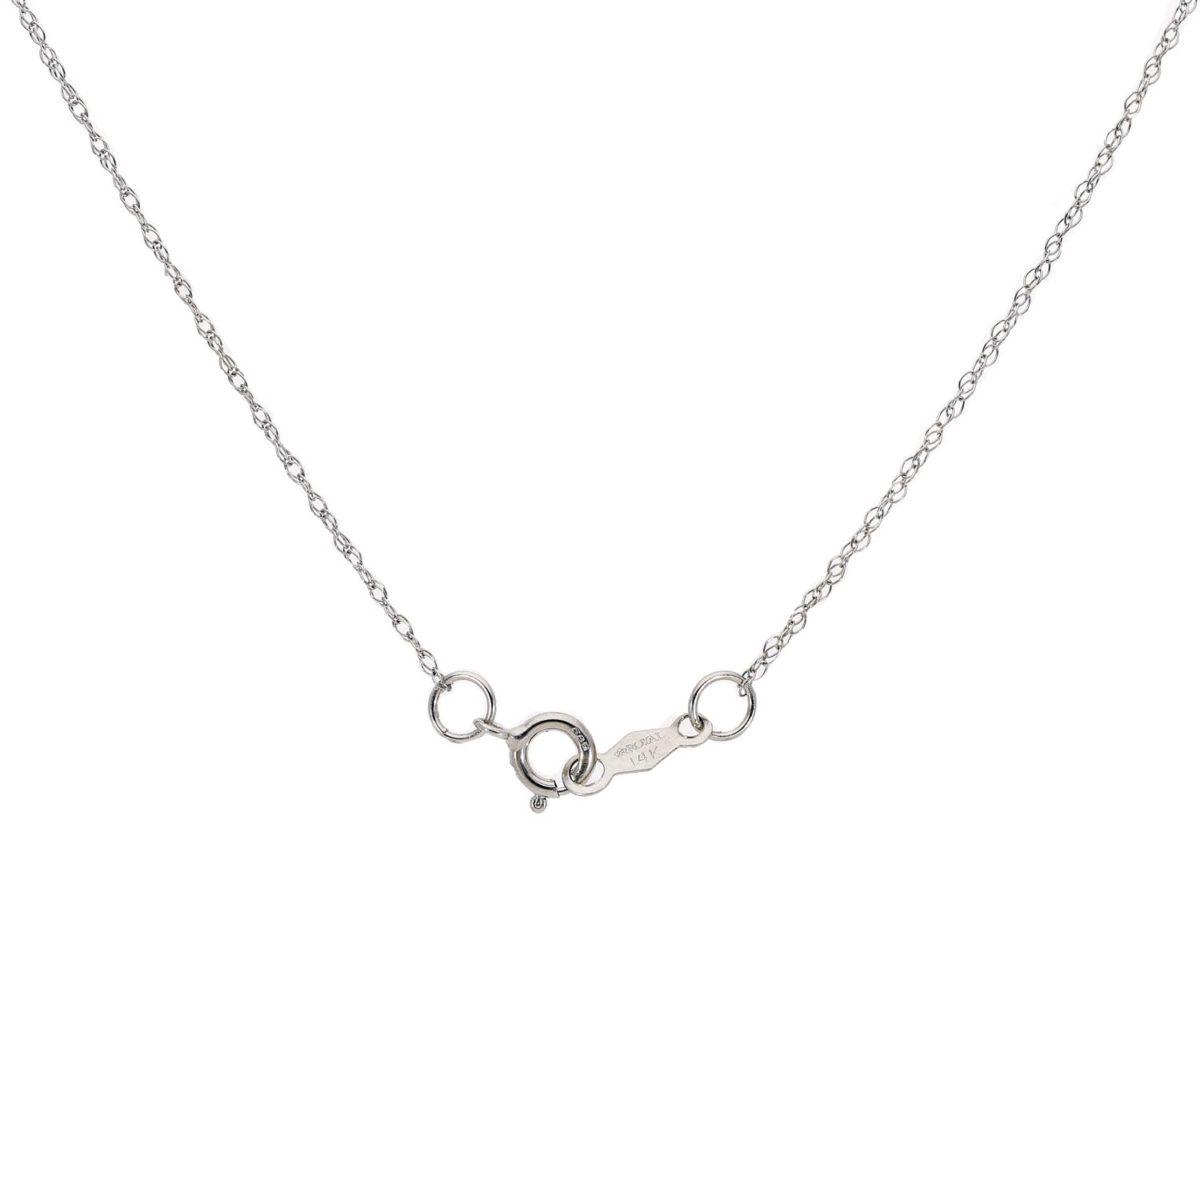 Diamond NecklaceStyle #: ROY-WC9891D